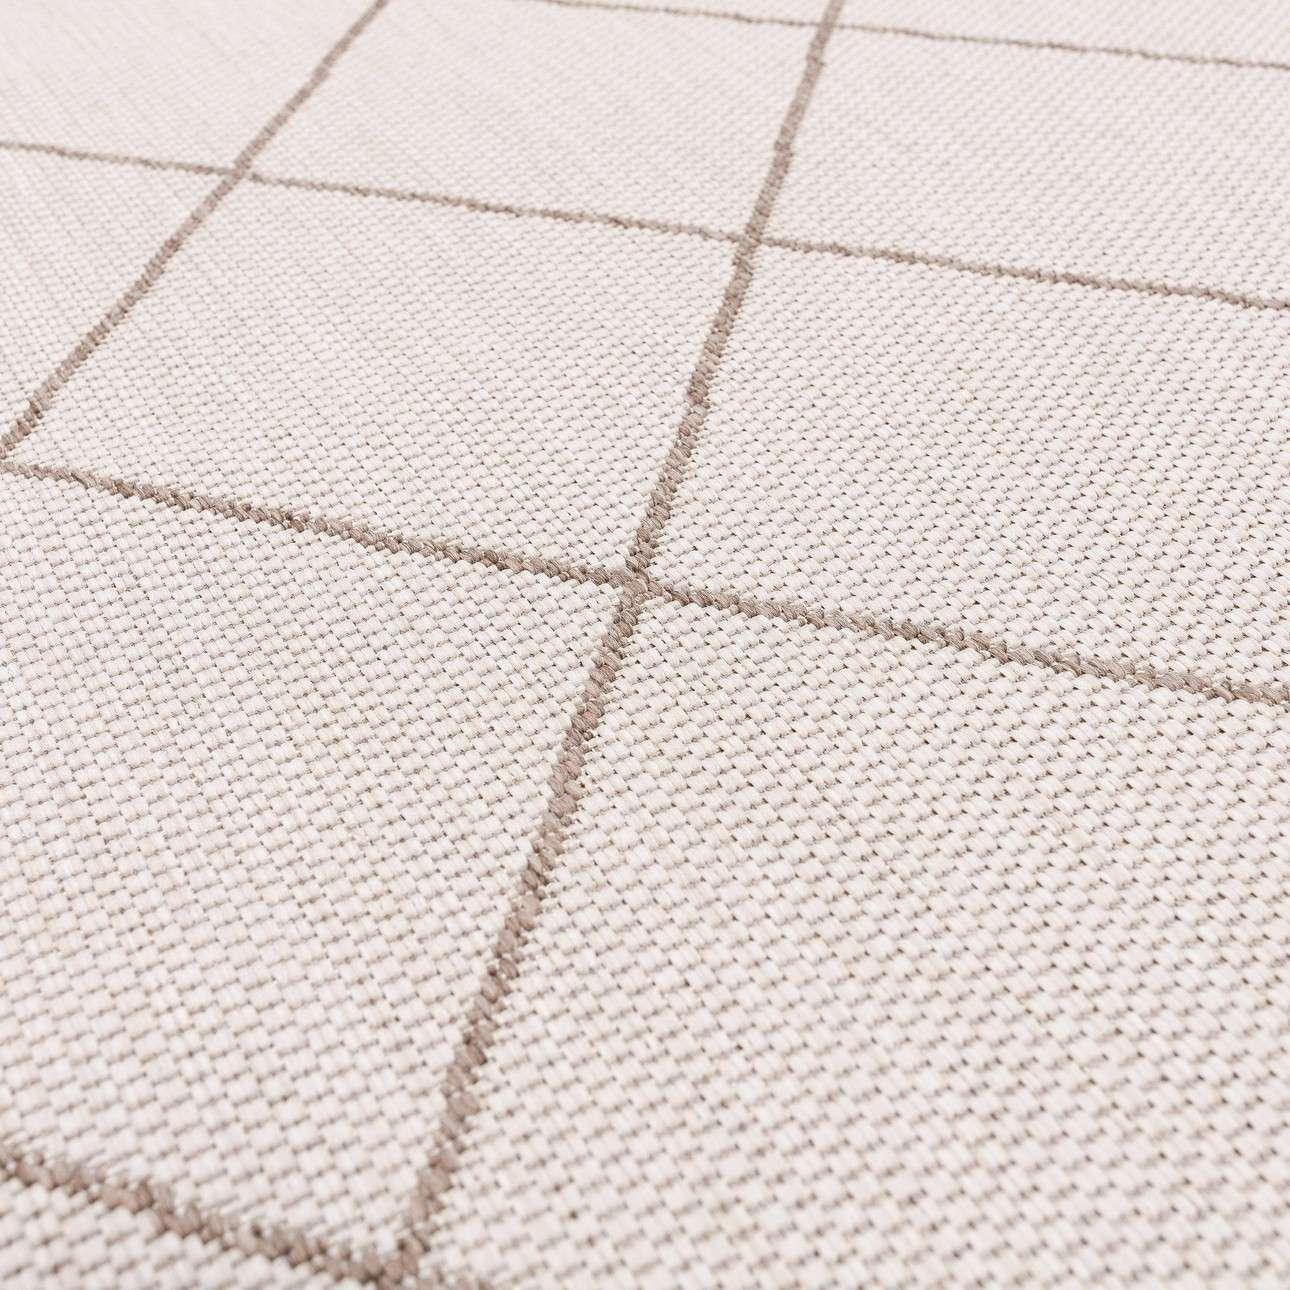 Teppich Lineo Rhombs wool/mink 120x170cm